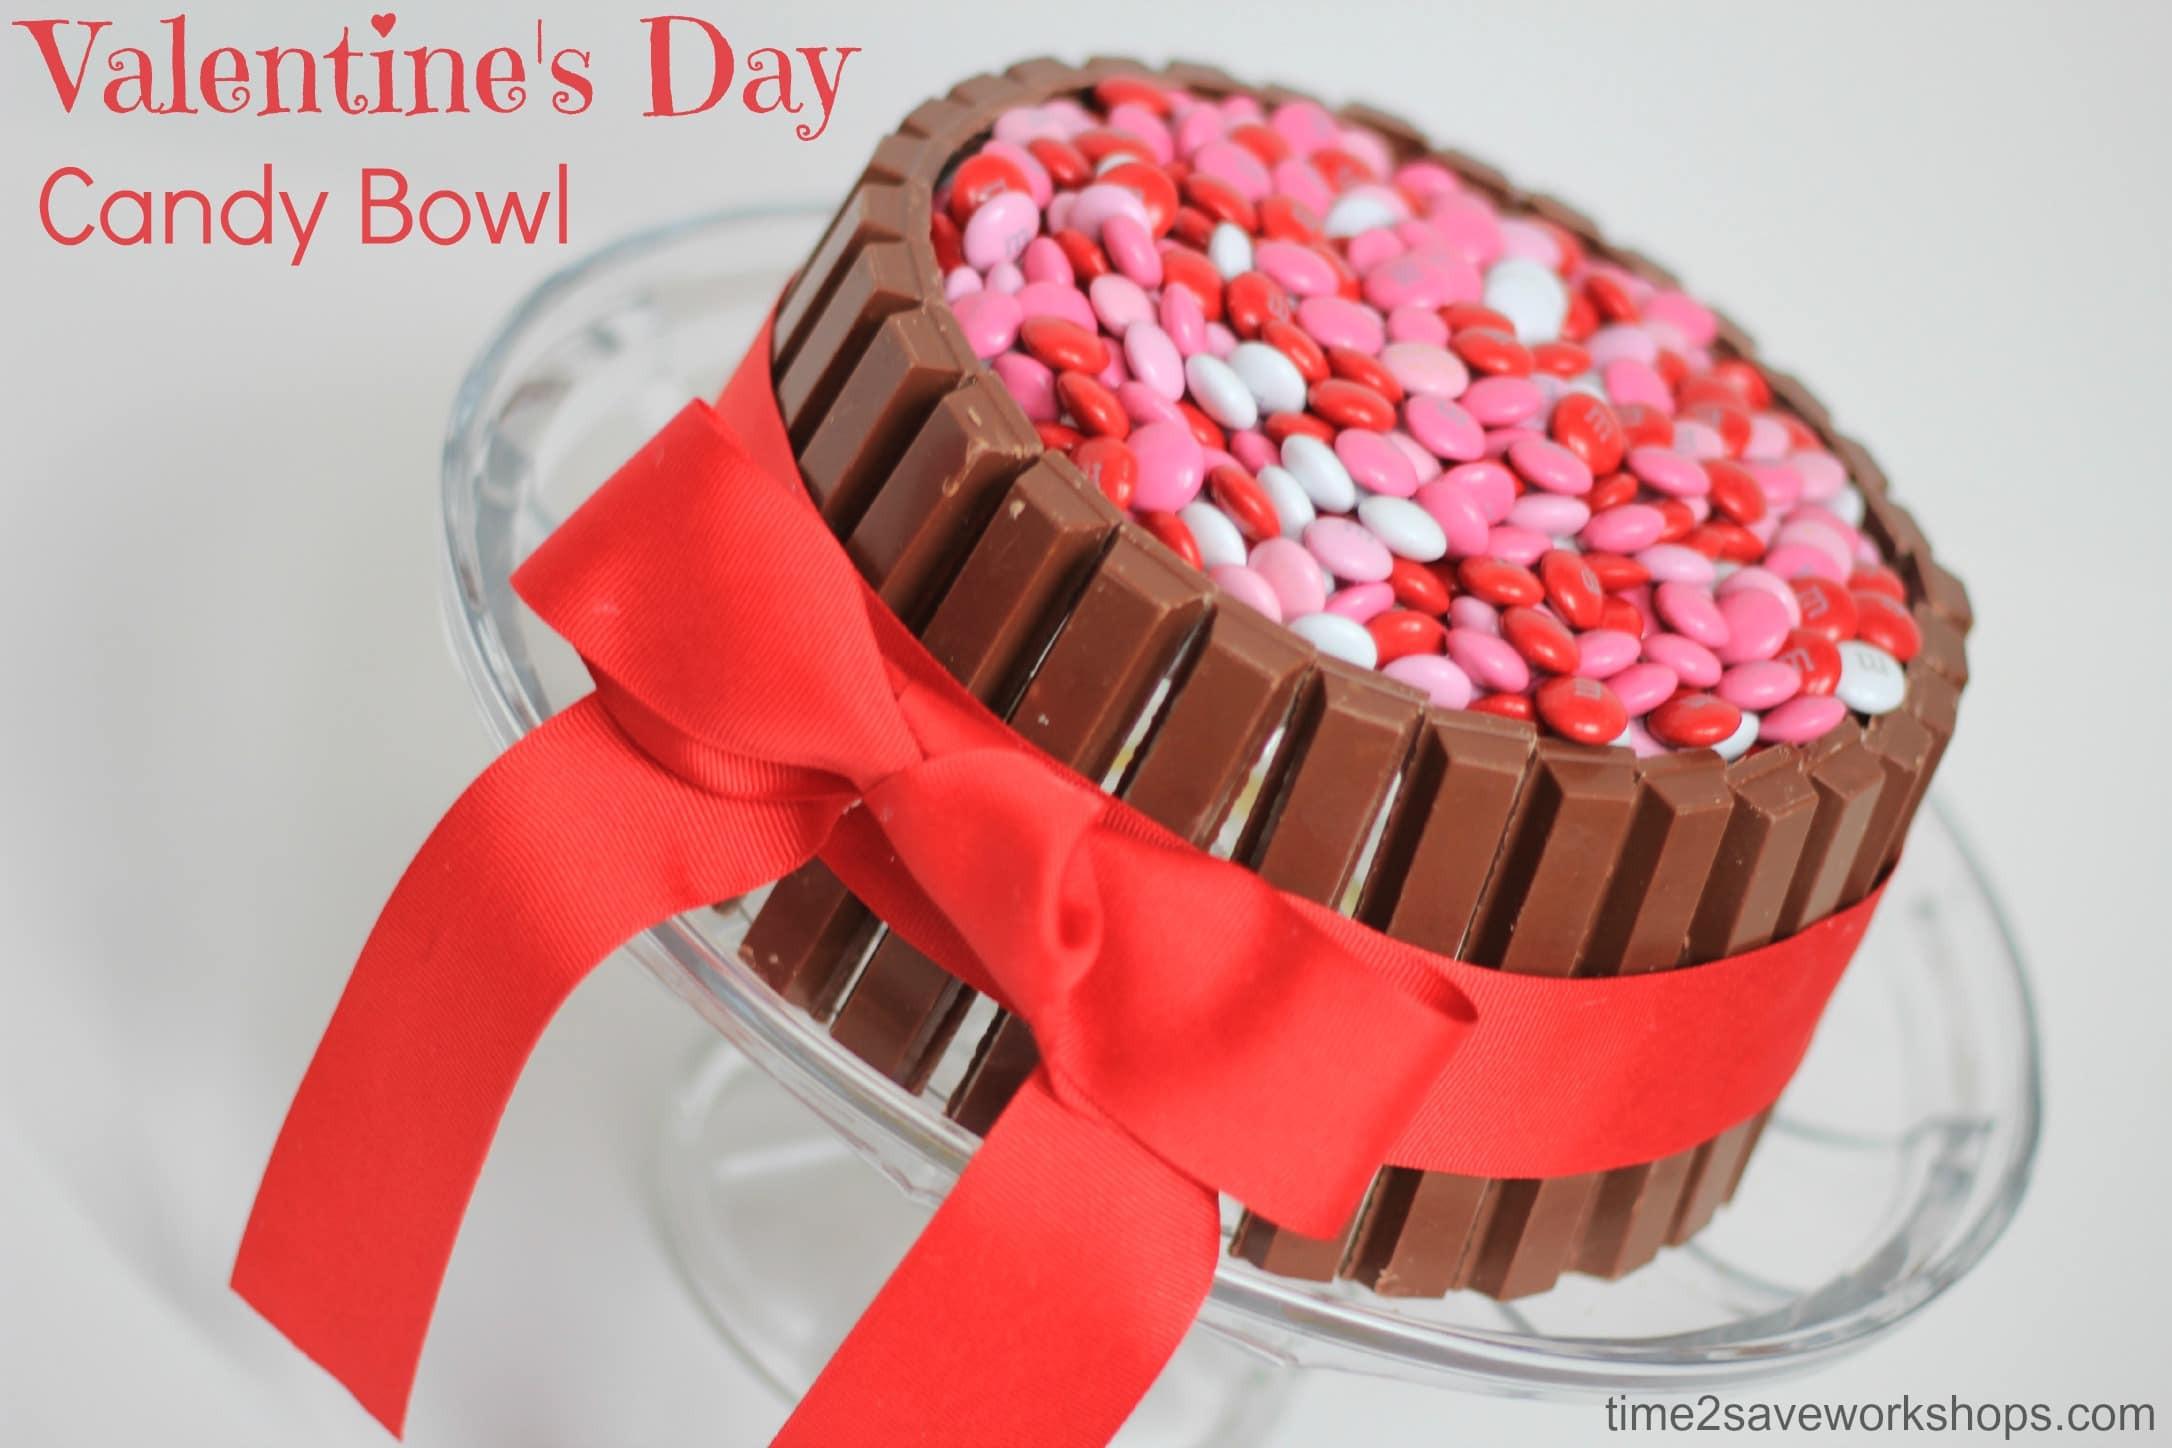 Valentine Candy Gift Ideas  Cute Valentine s Day Ideas DIY Candy Bowl Kasey Trenum